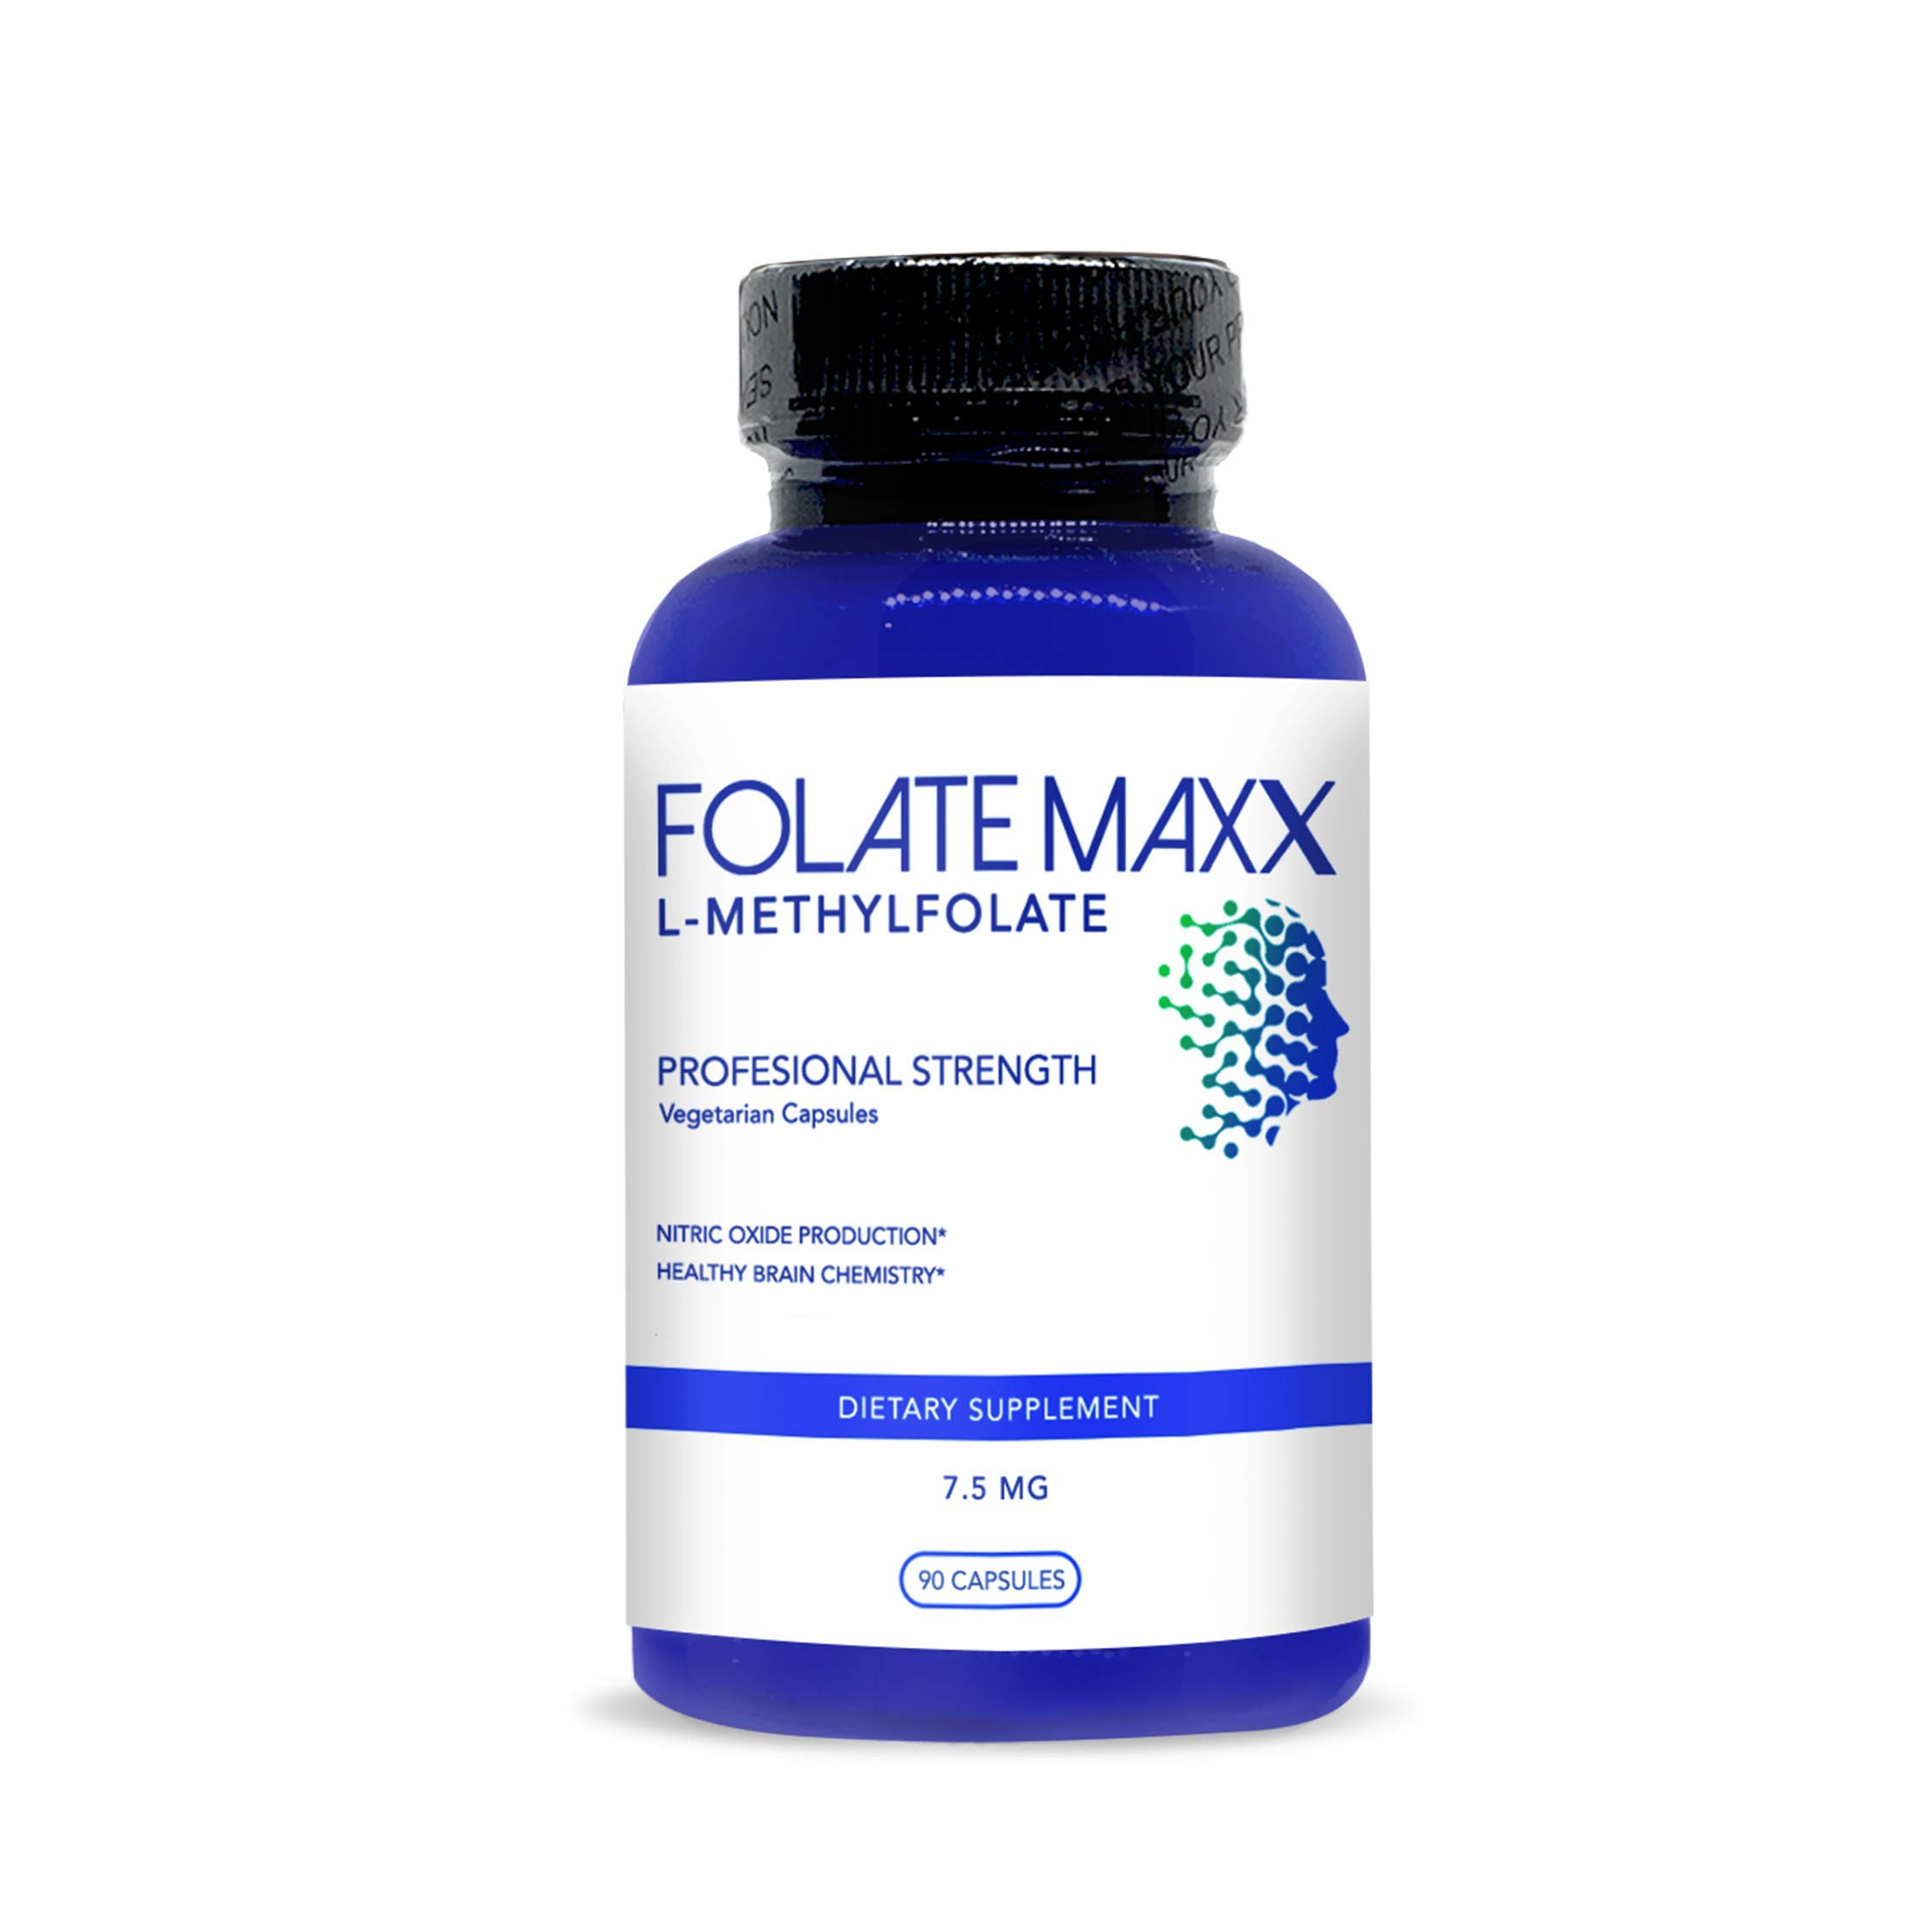 FolateMaxx L-Methylfolate 7.5 mg (90 Capsules)] Professional Top Quality Active Folate ] Non-GMO, Gluten Free ] Methyl Folate, 5-MTHF